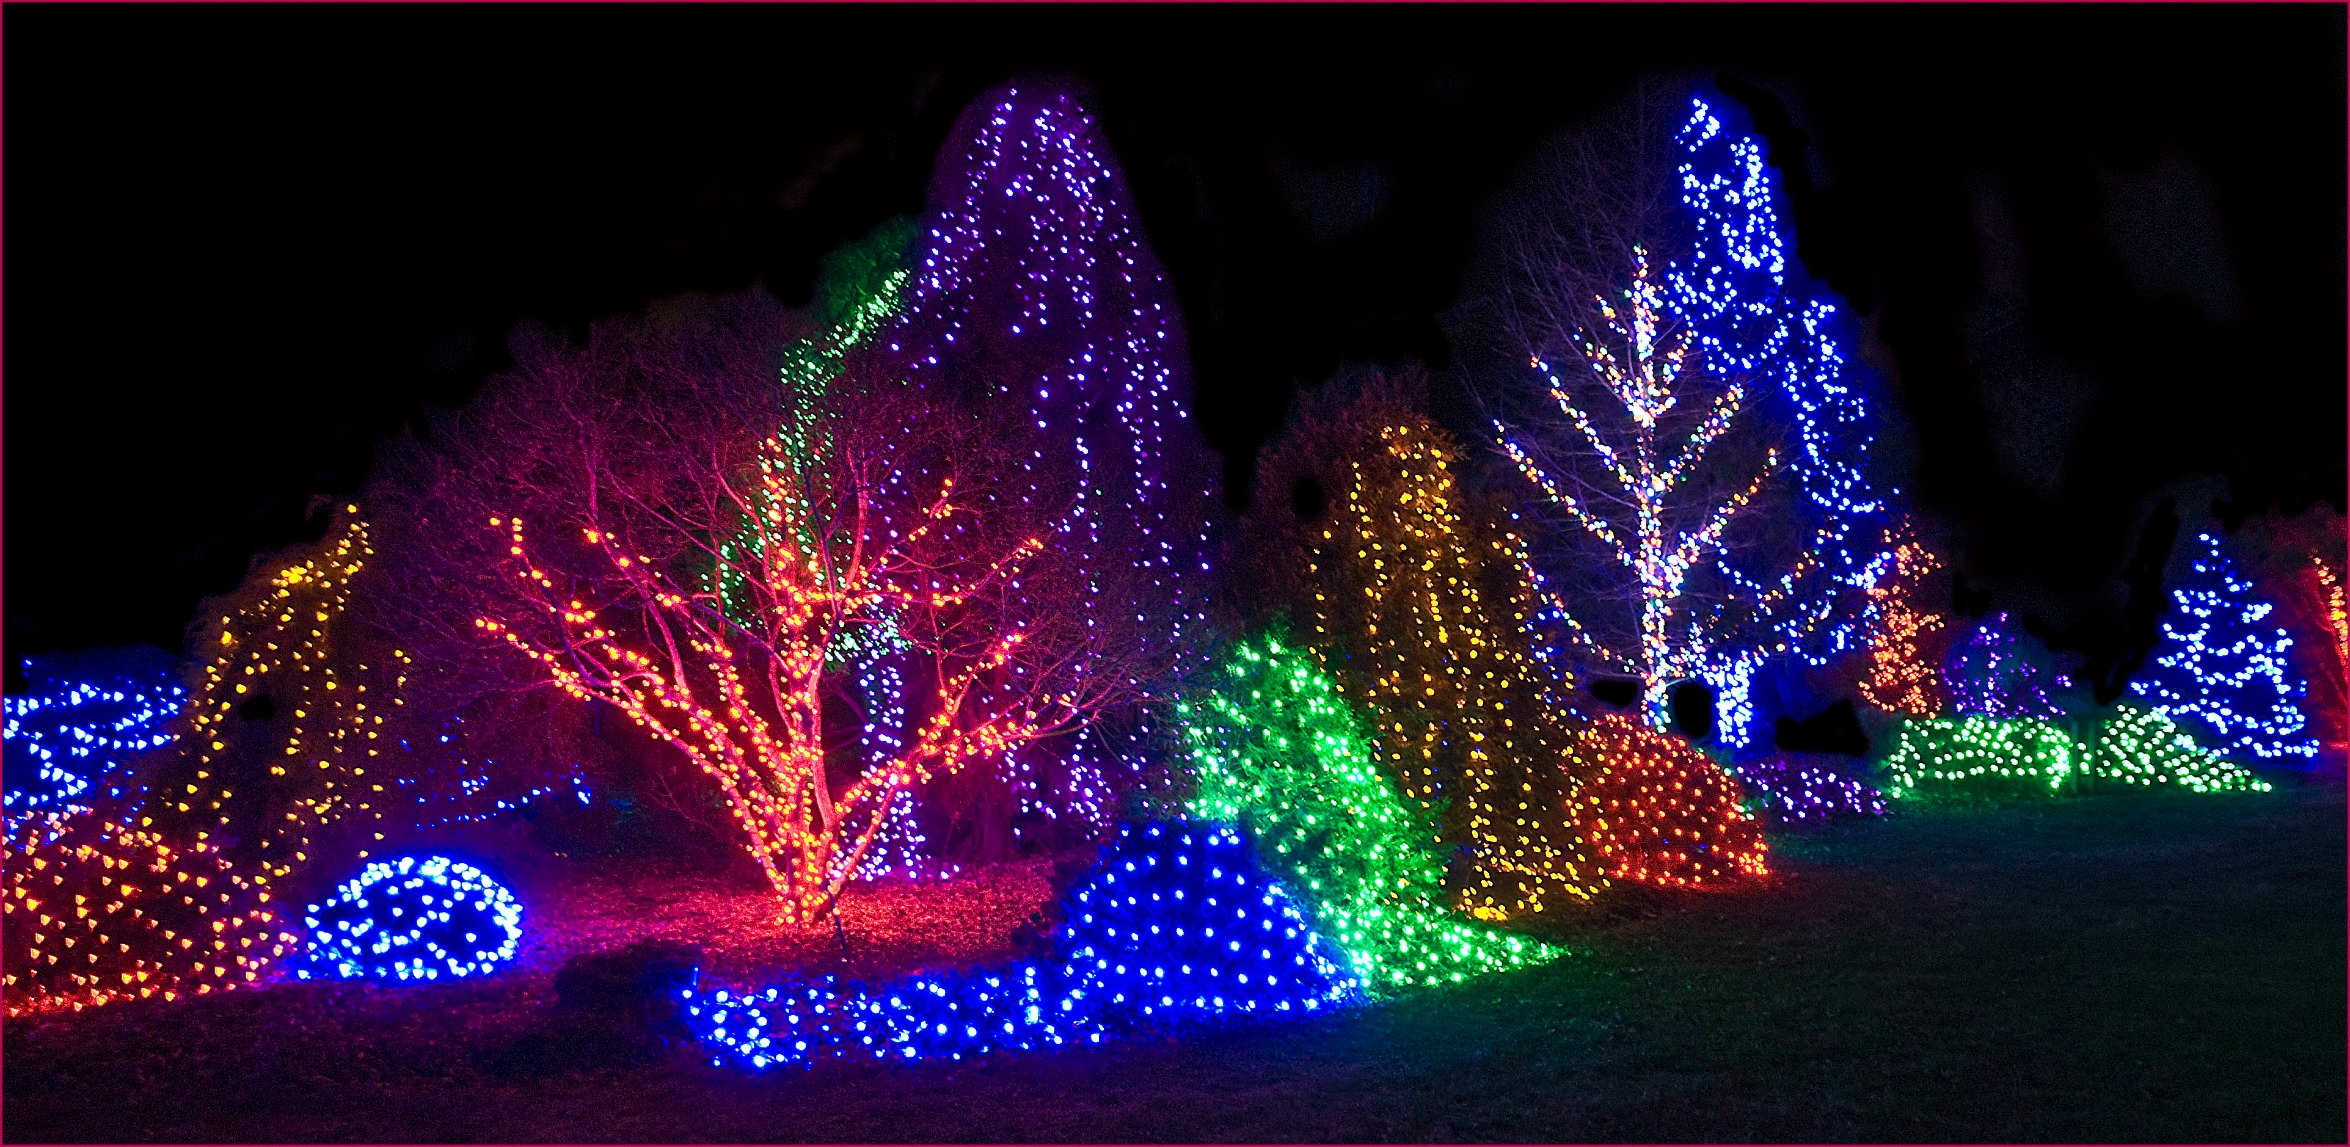 Light displays at the 2013 Meadowlark Winter Walk of Lights in Vienna, Virginia.